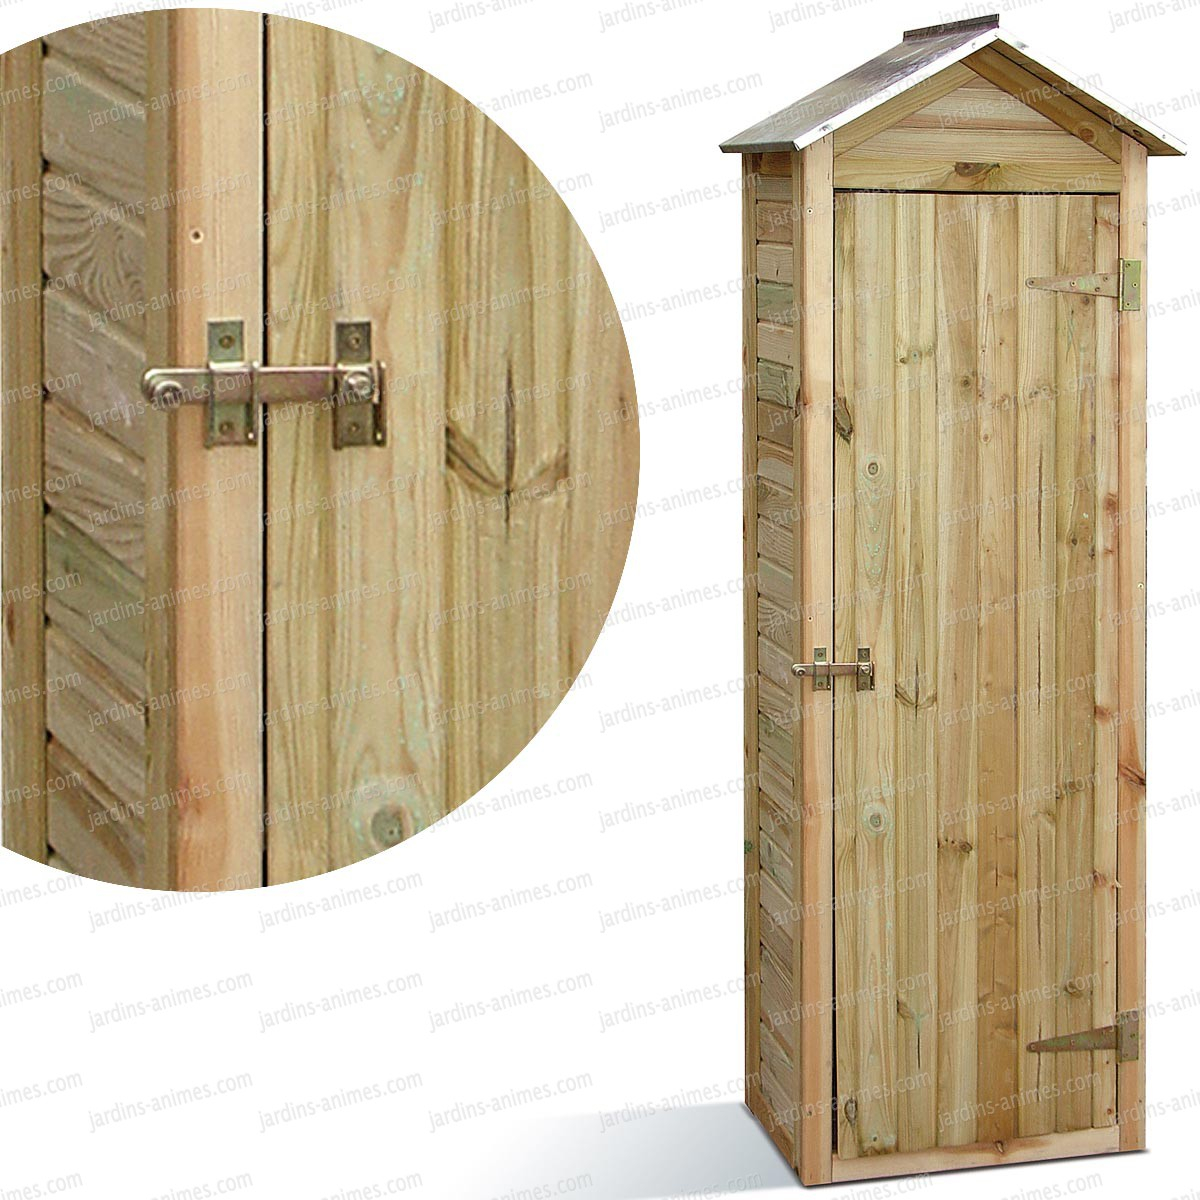 Nettoyage Armoire En Bois meuble de jardin en bois meubles rangement jardin bois